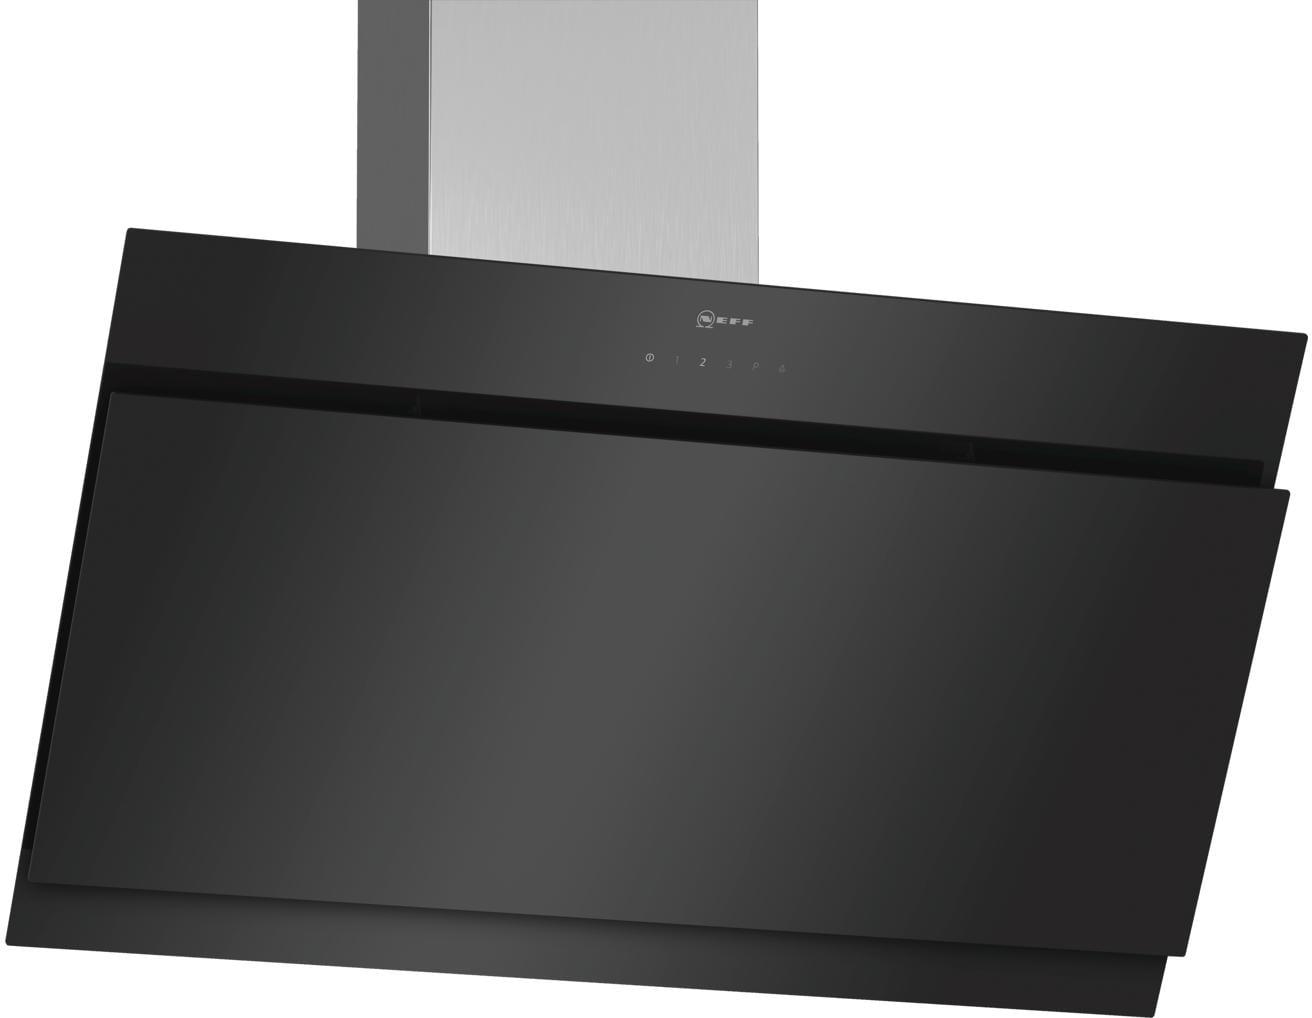 neff dihm951s d95ihm1s0 kopffrei dunstabzugshaube 89 cm. Black Bedroom Furniture Sets. Home Design Ideas